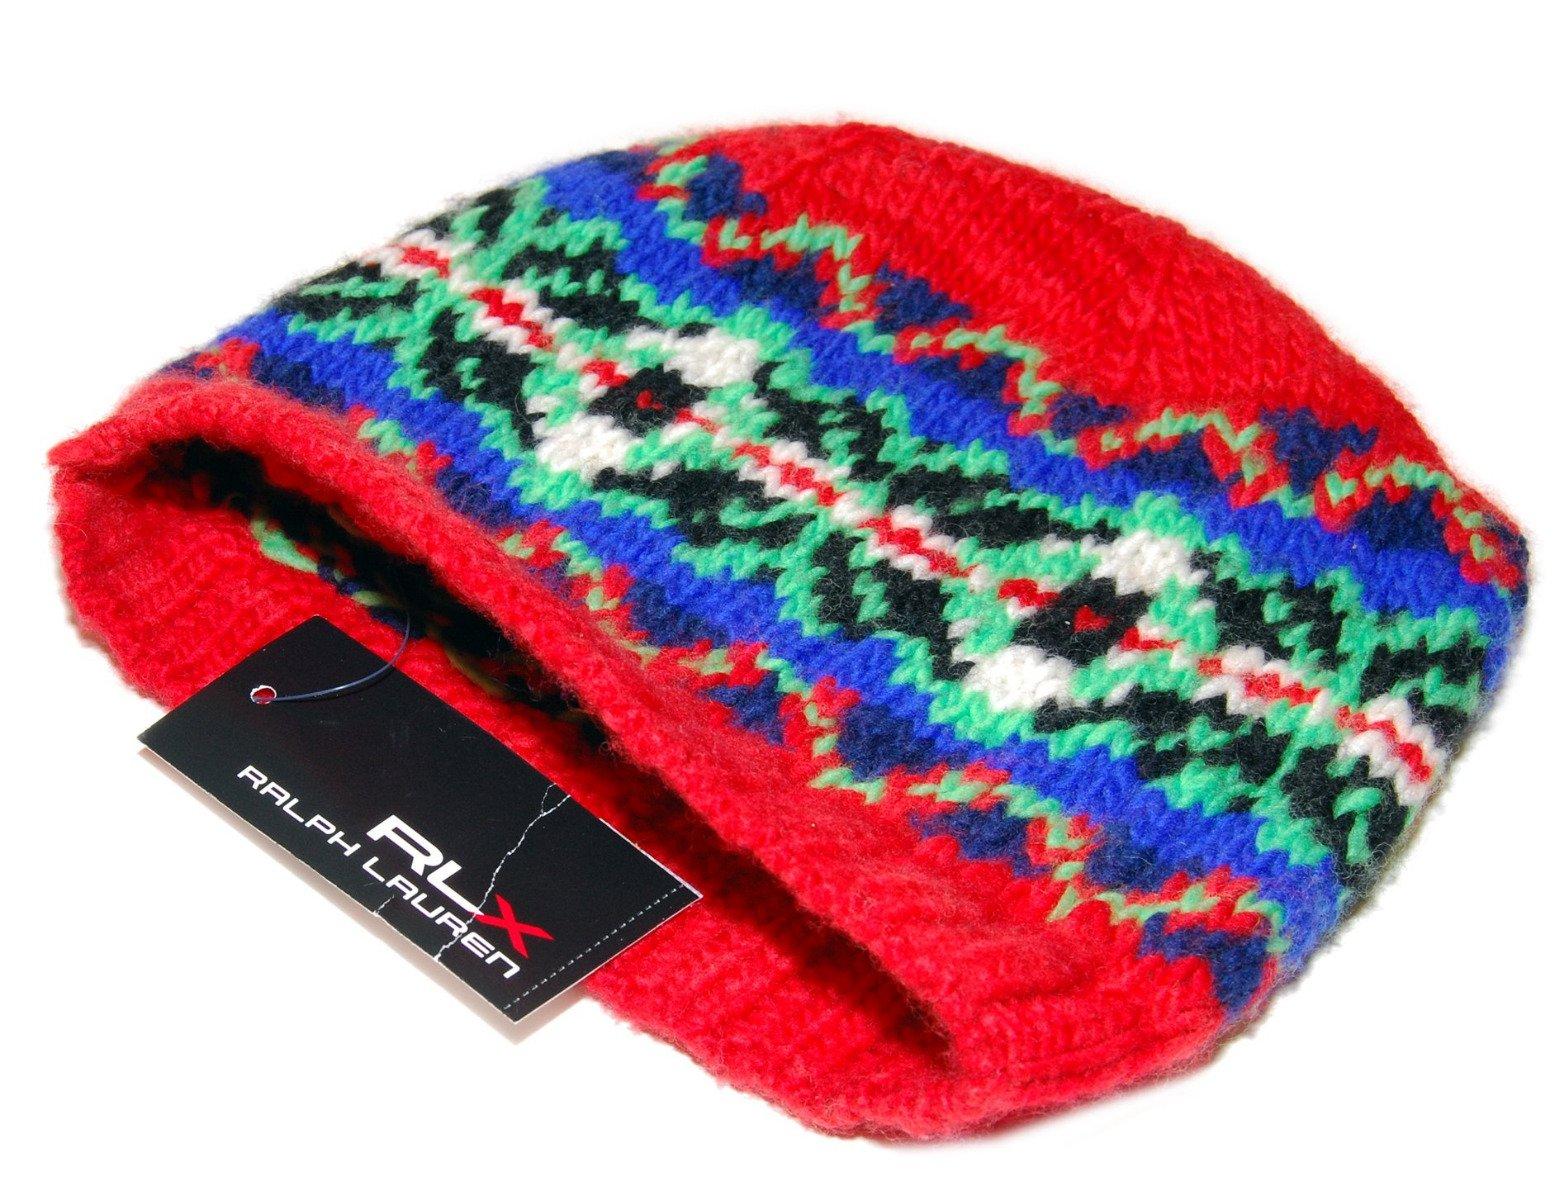 Ralph Lauren RLX Mens Womens Merino Wool Ski Skull Knit Hat Cap Red Blue Green